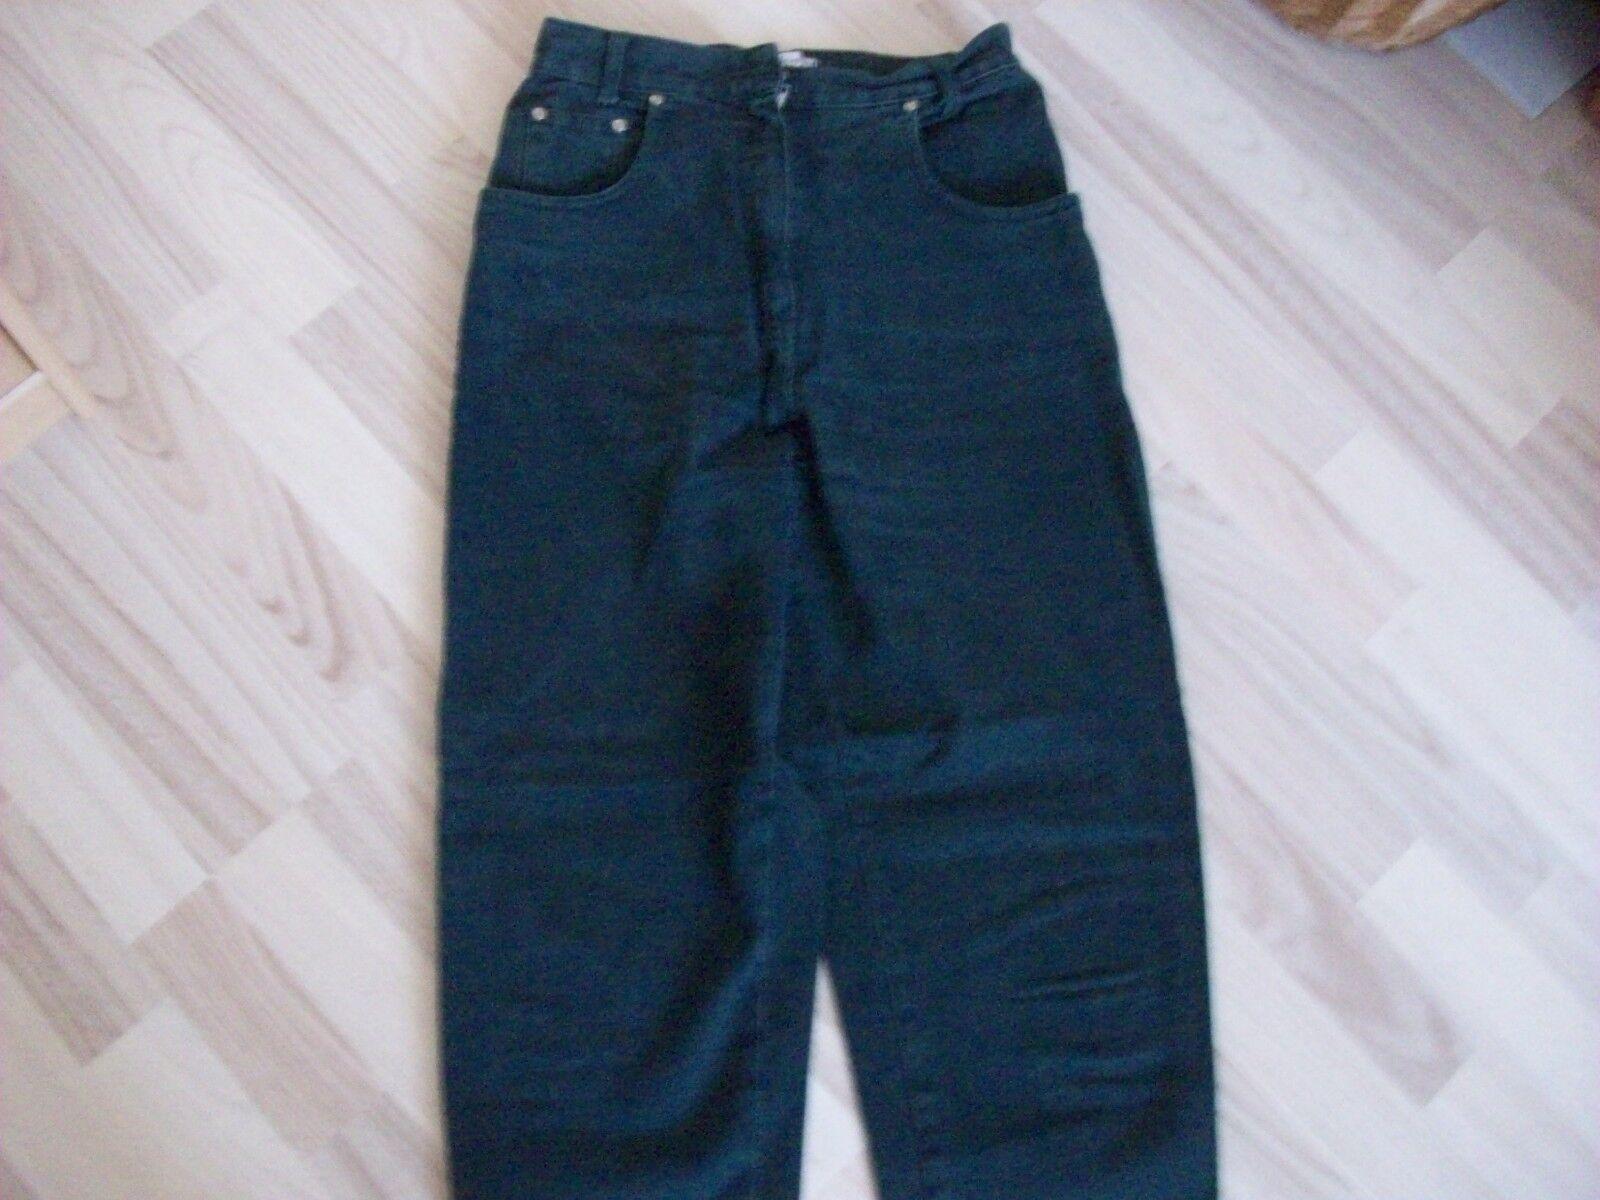 1 Damen Jeanshose / Gr. 38 petrolgrün